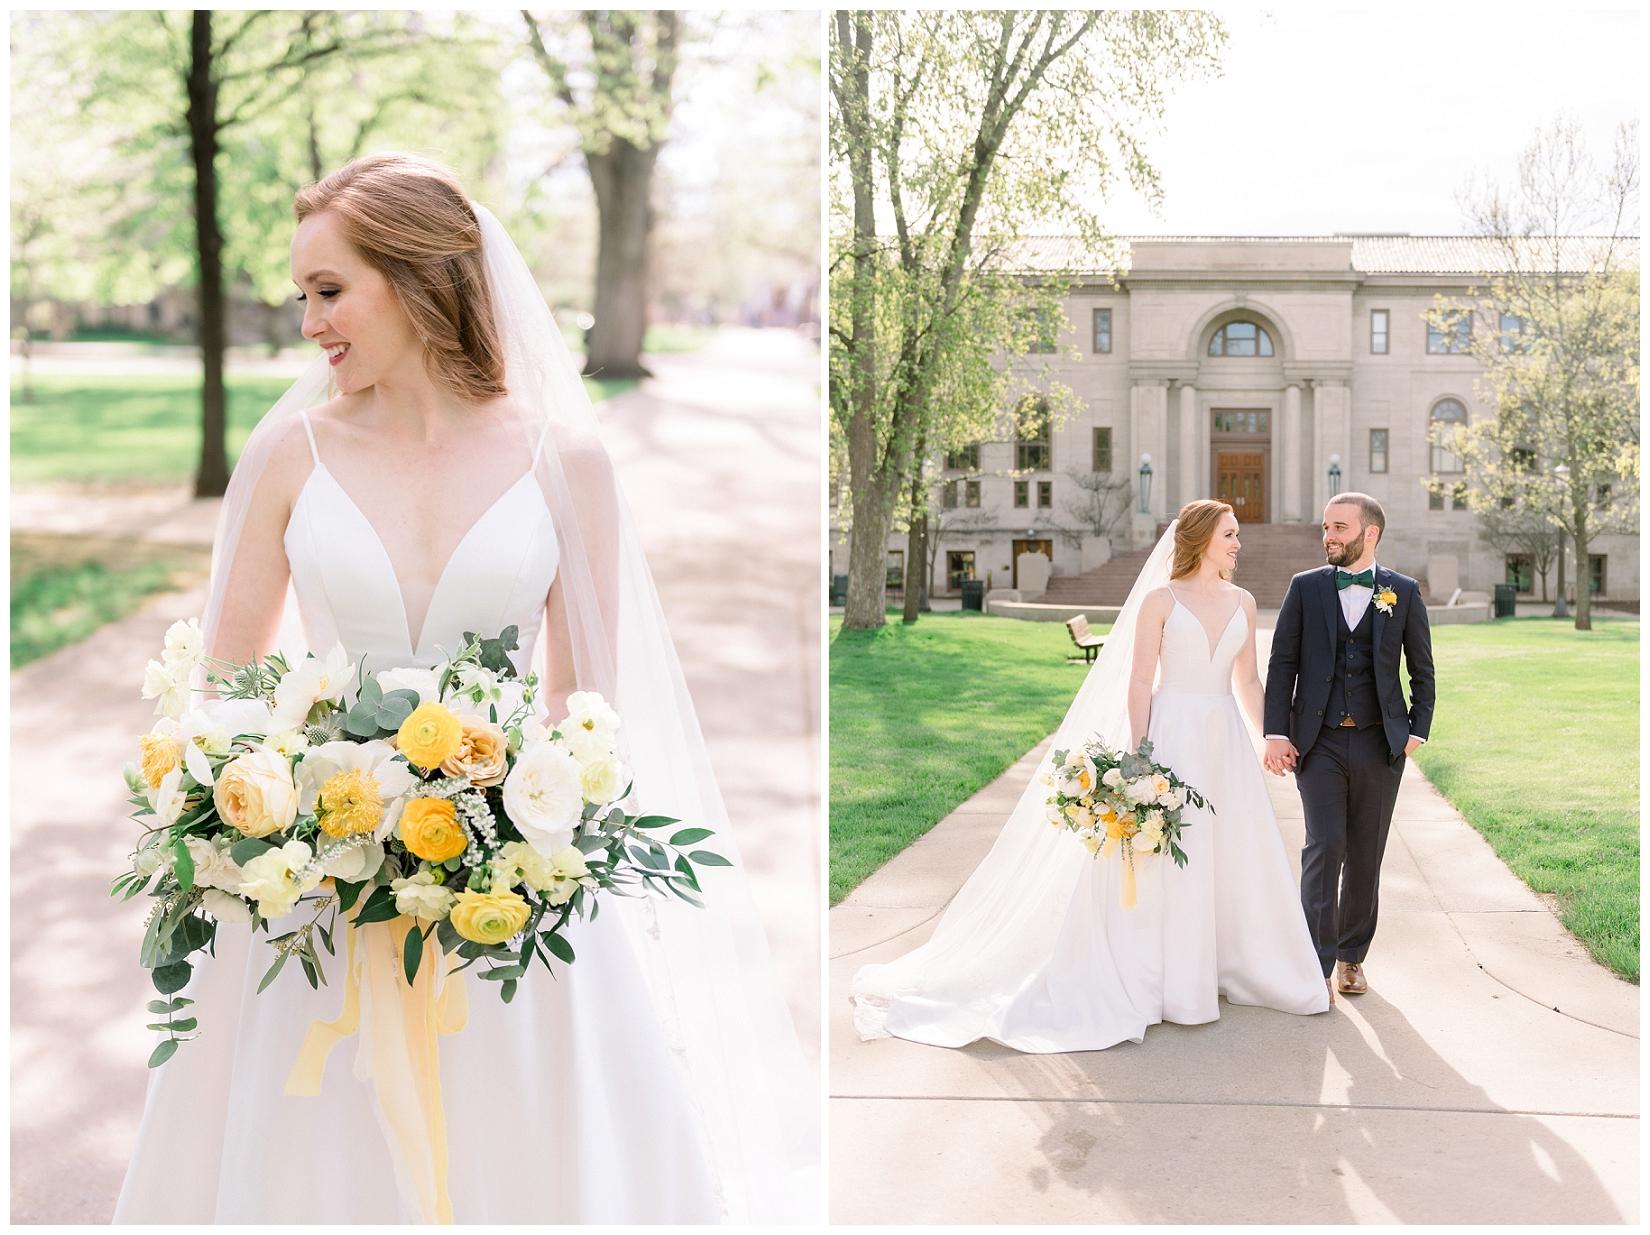 cat-alkire-wedding-photographer-indiana-chicago-indianapolis-fort-wayne_1214.jpg